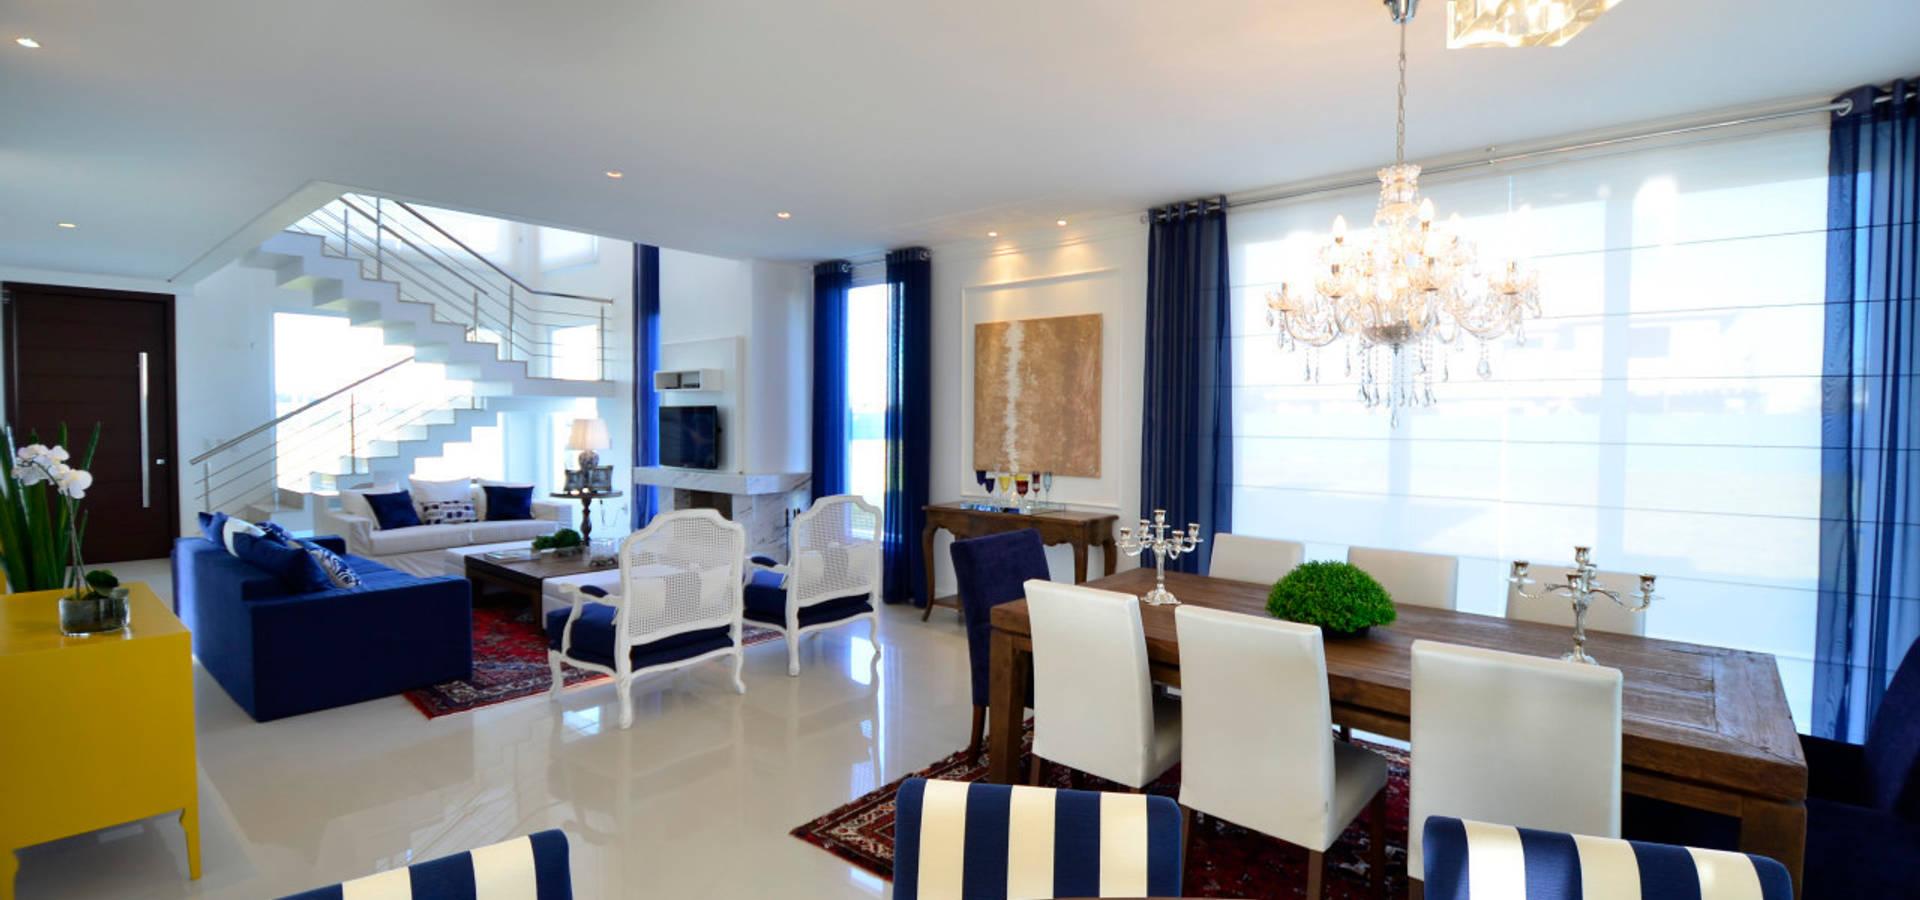 marli lima designer de interiores